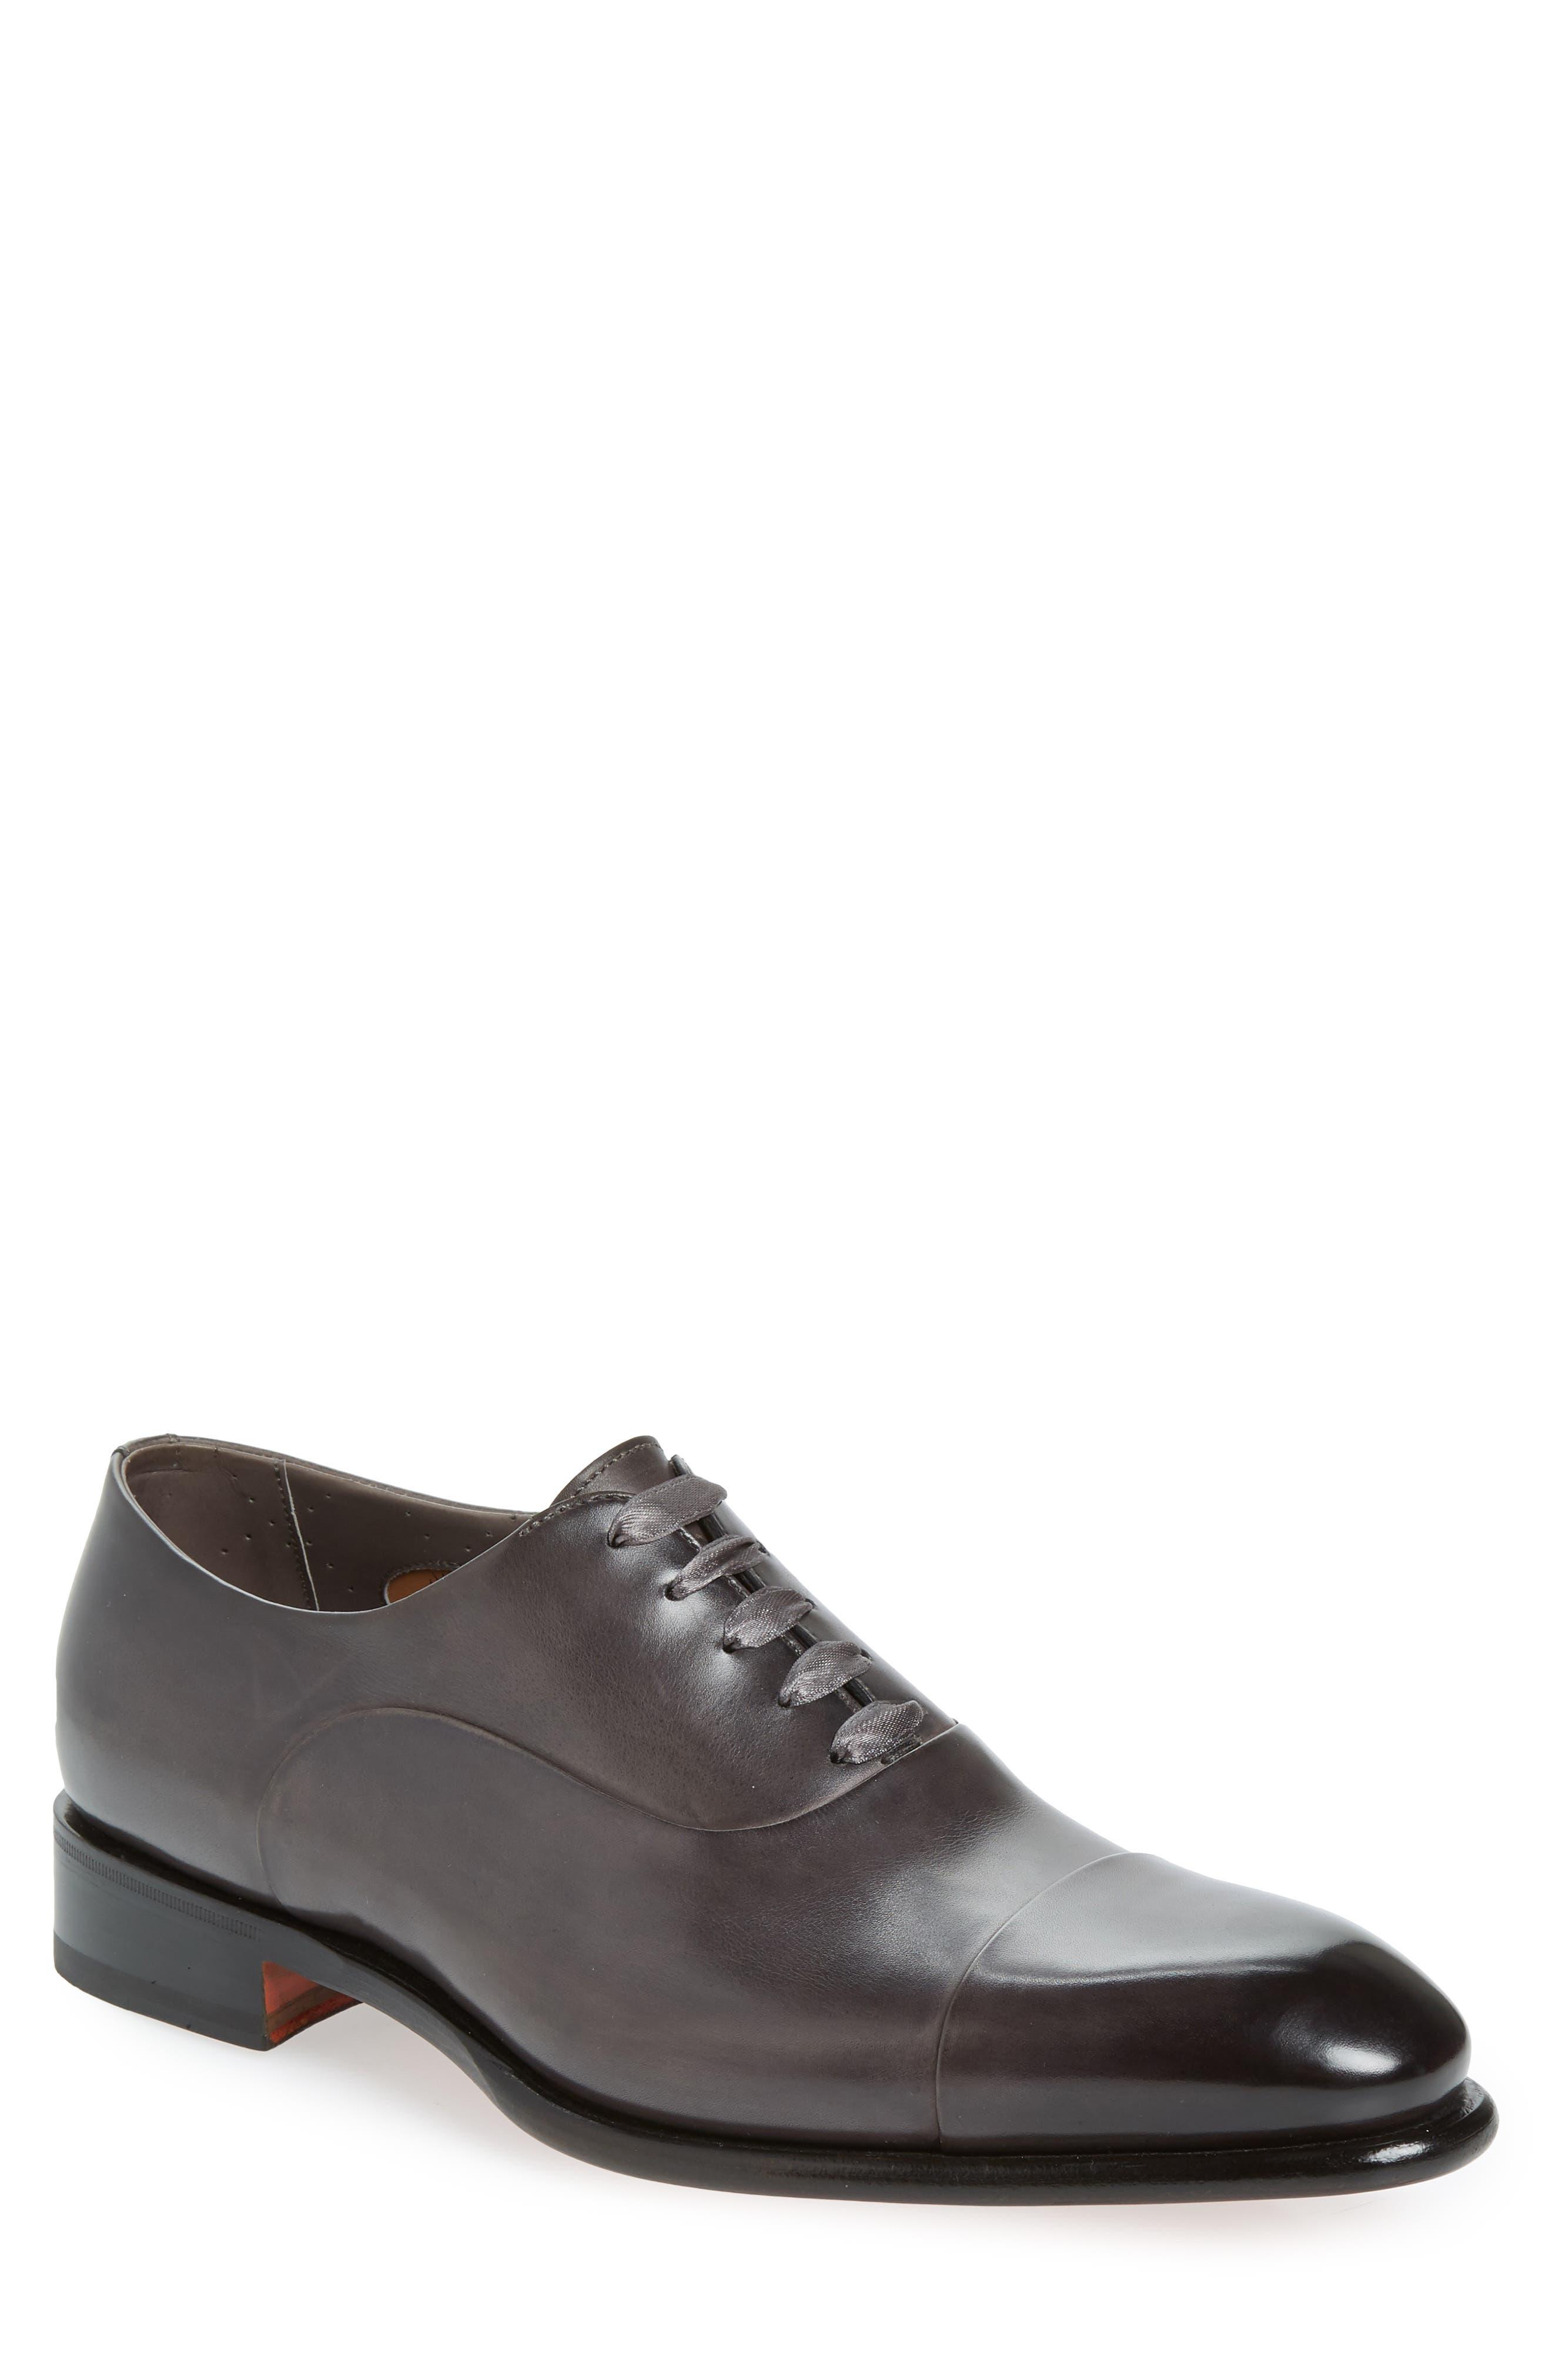 Men's Santoni Shoes | Nordstrom